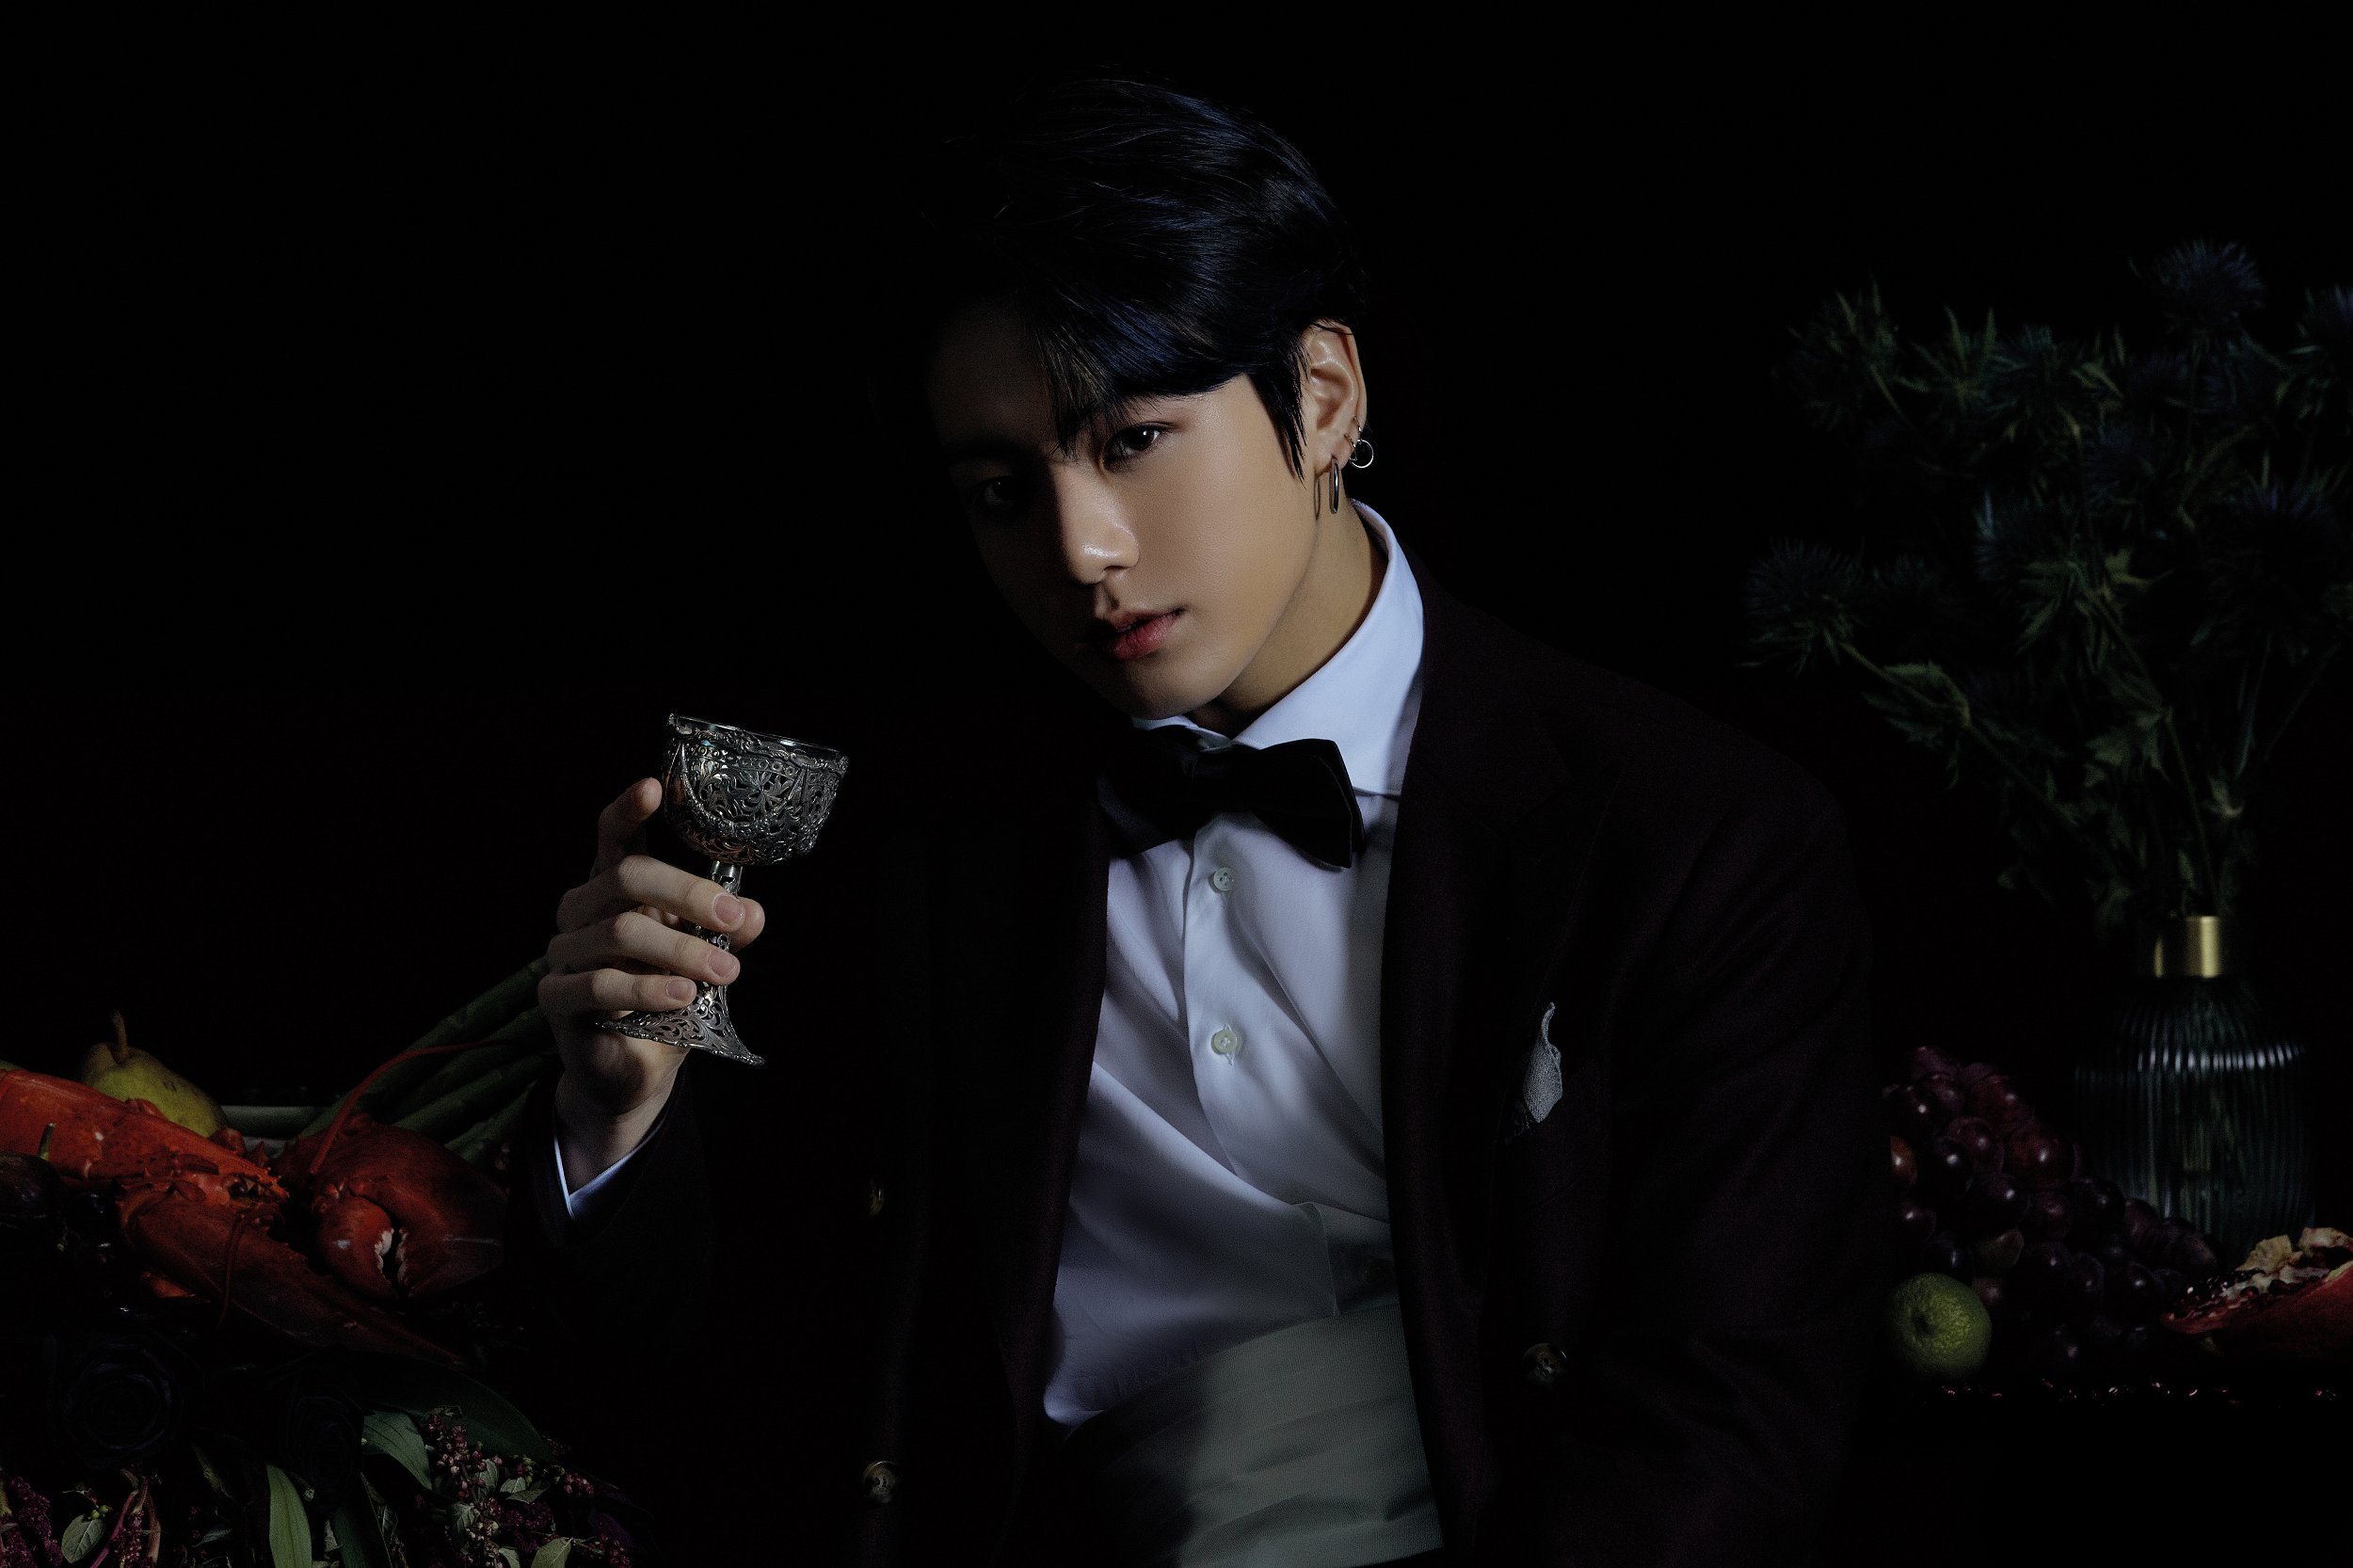 bts map of the soul 7 concept teaser 3 Jungkook